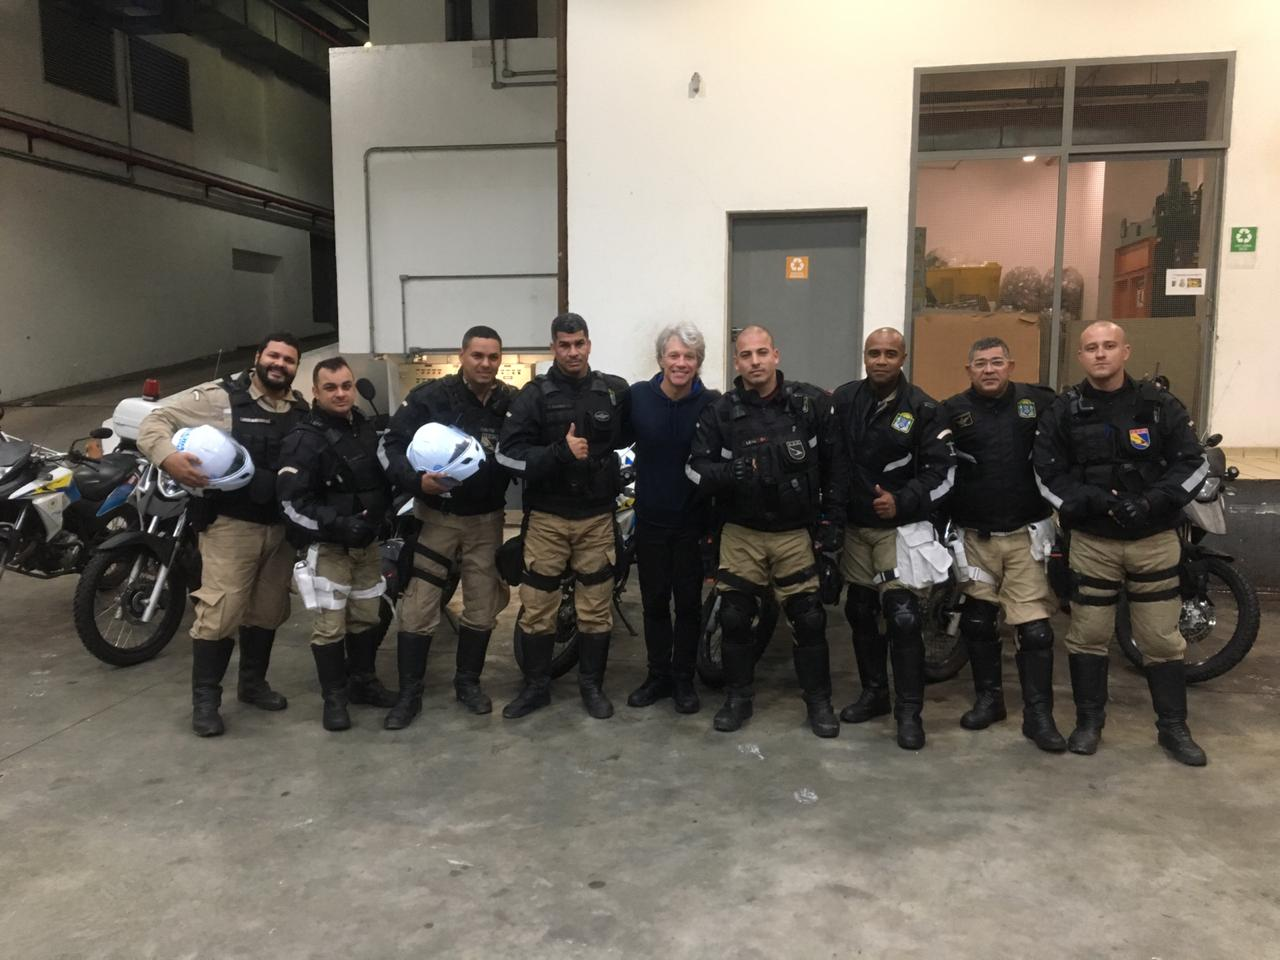 Guardas municipais atuam na escolta do cantor americano Bon Jovi no Rock in Rio